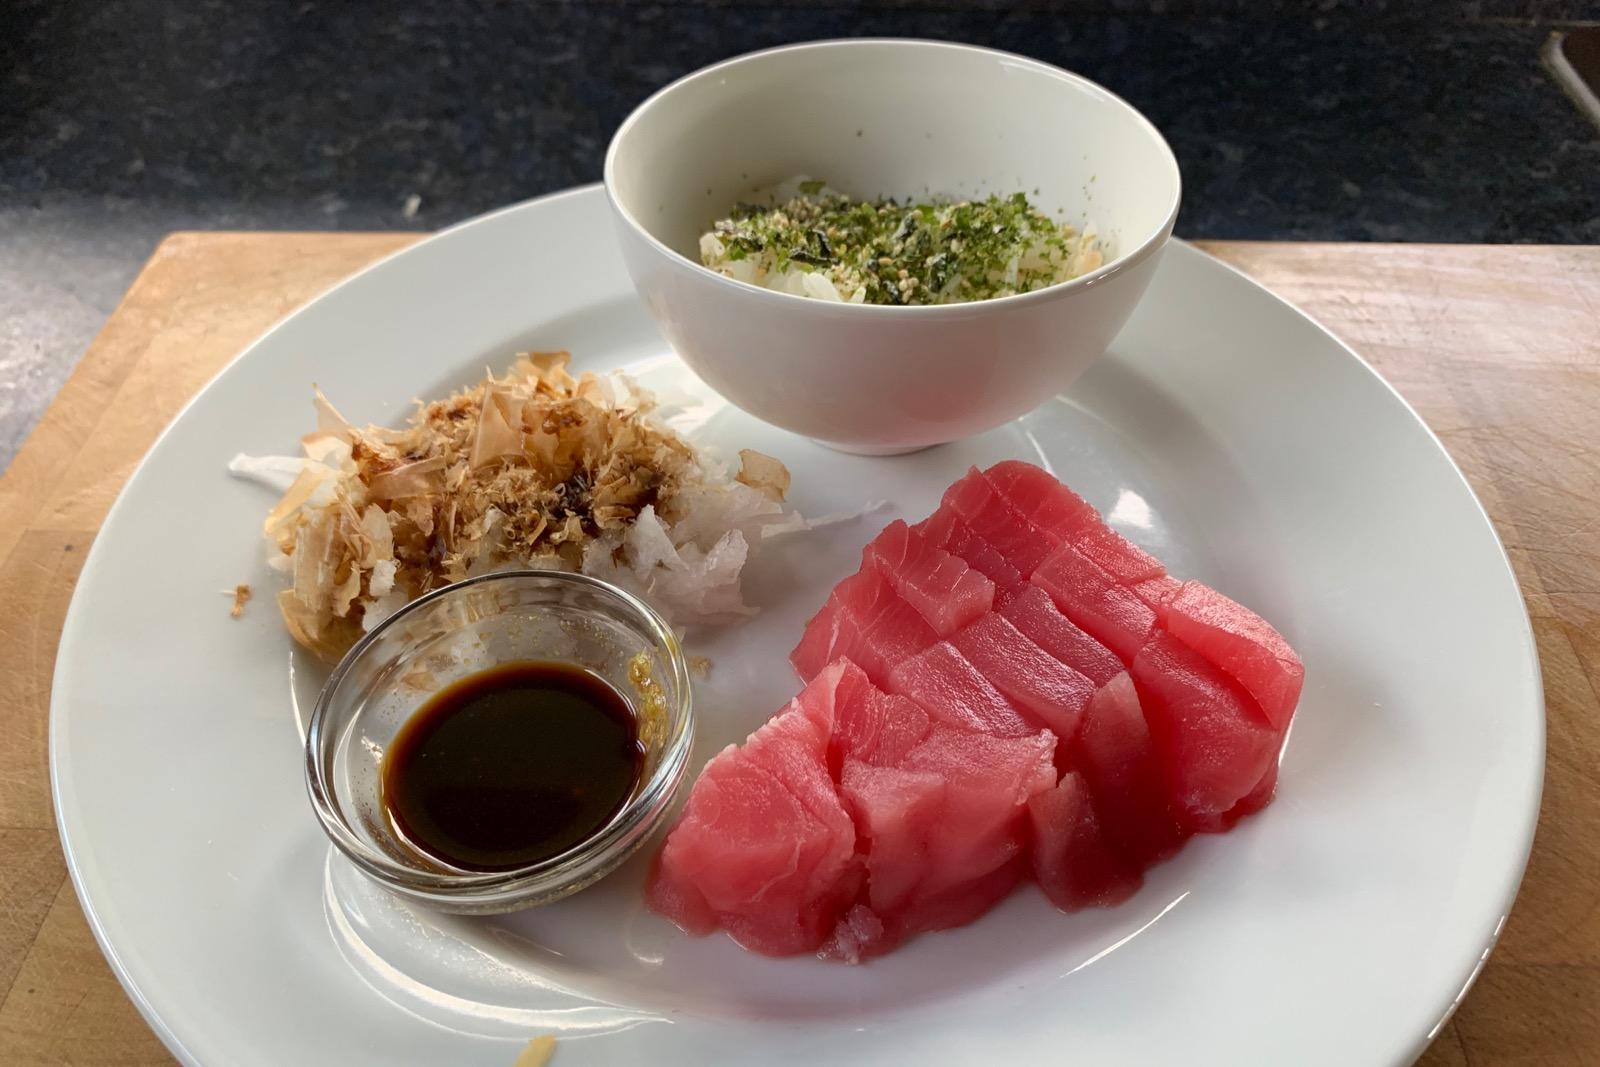 http://blog.rickk.com/food/2019/08/26/ate.2019.08.25.d.jpg